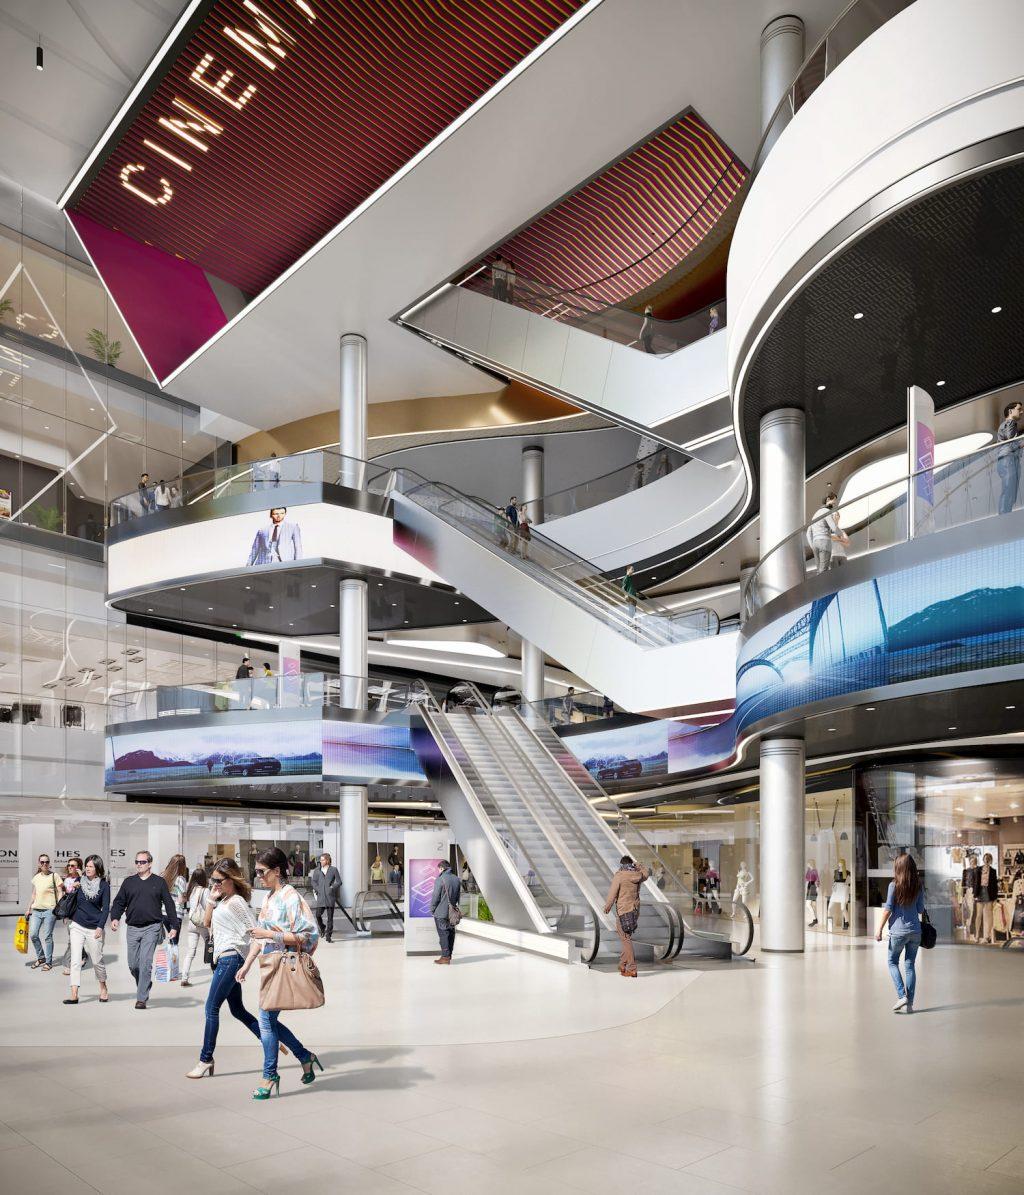 ETELE PLAZA Shopping mall interior